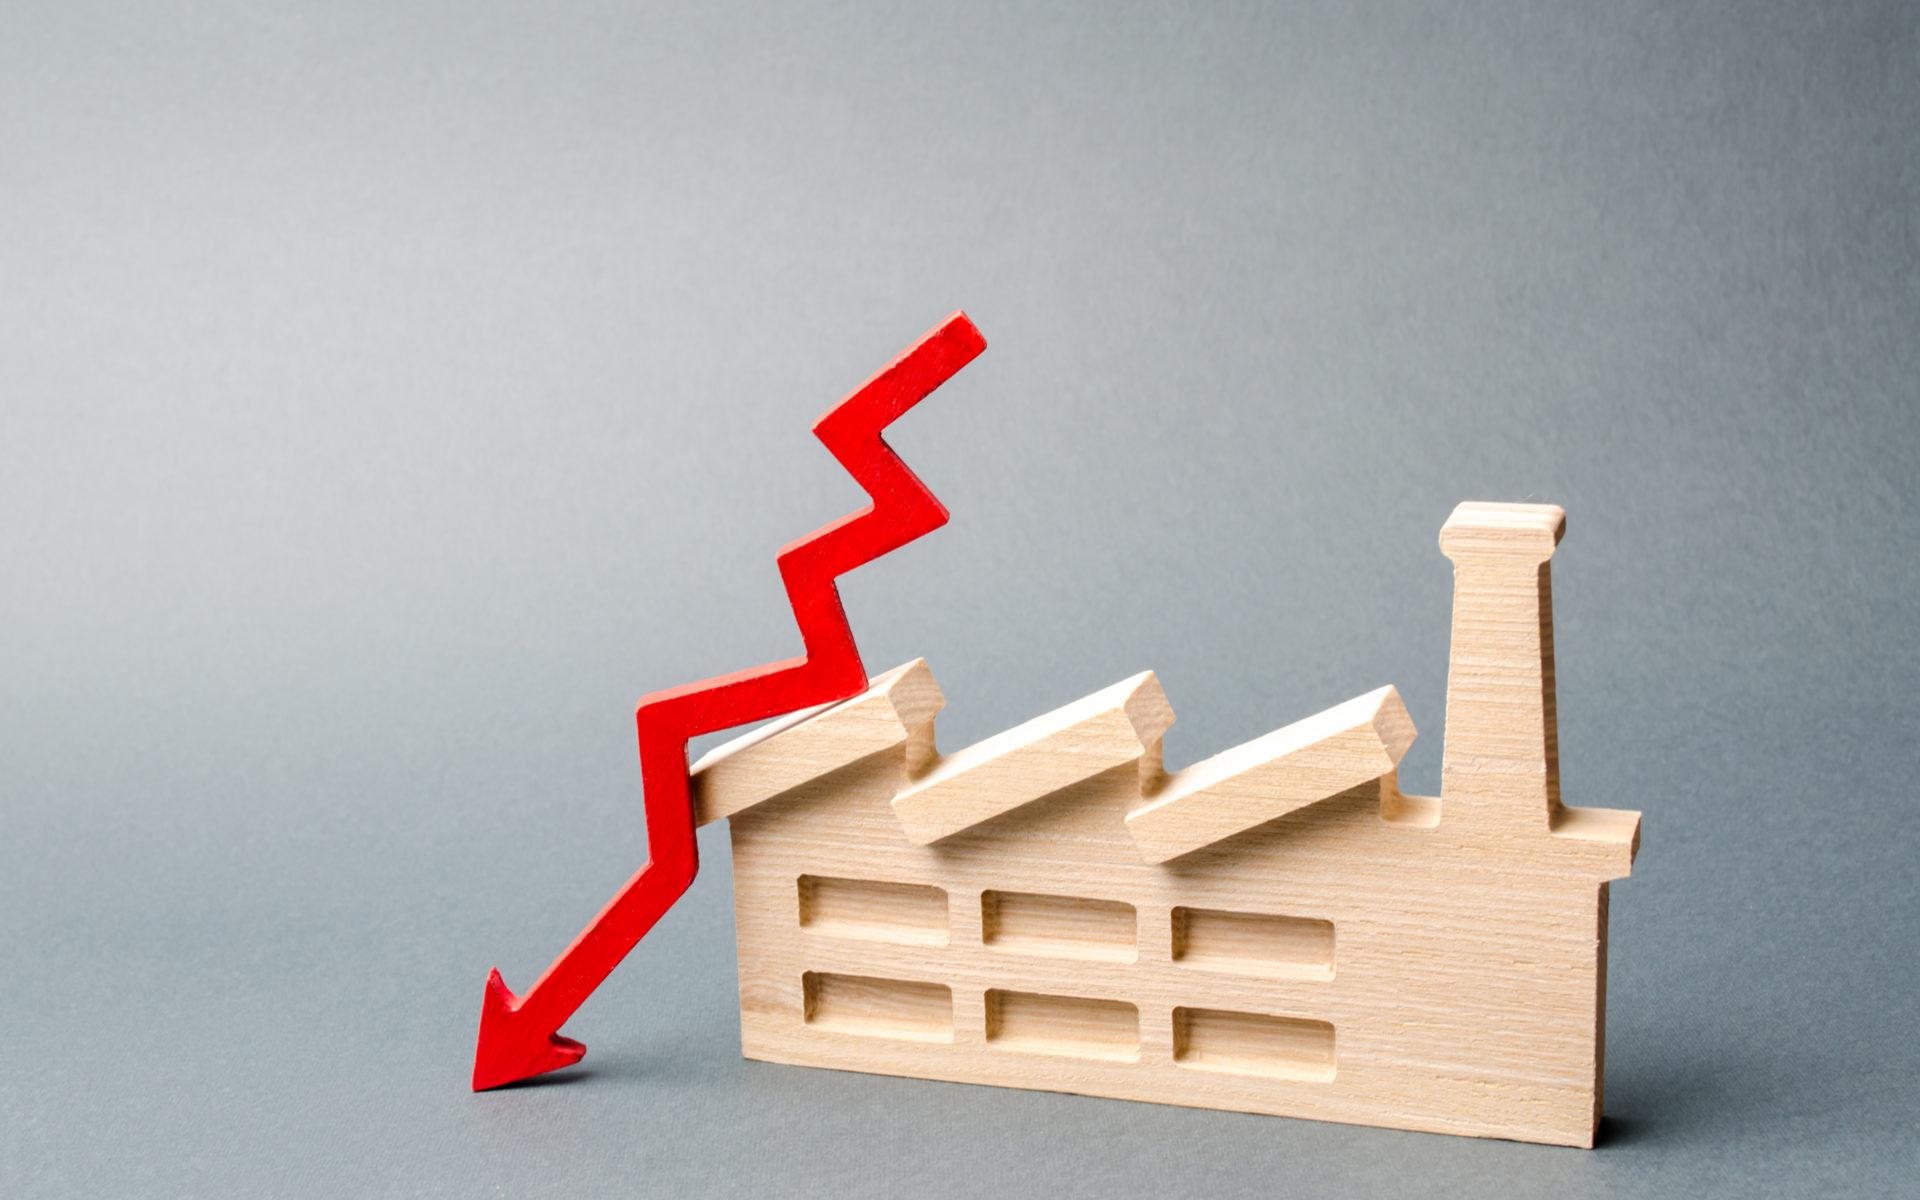 litecoin hash rate down